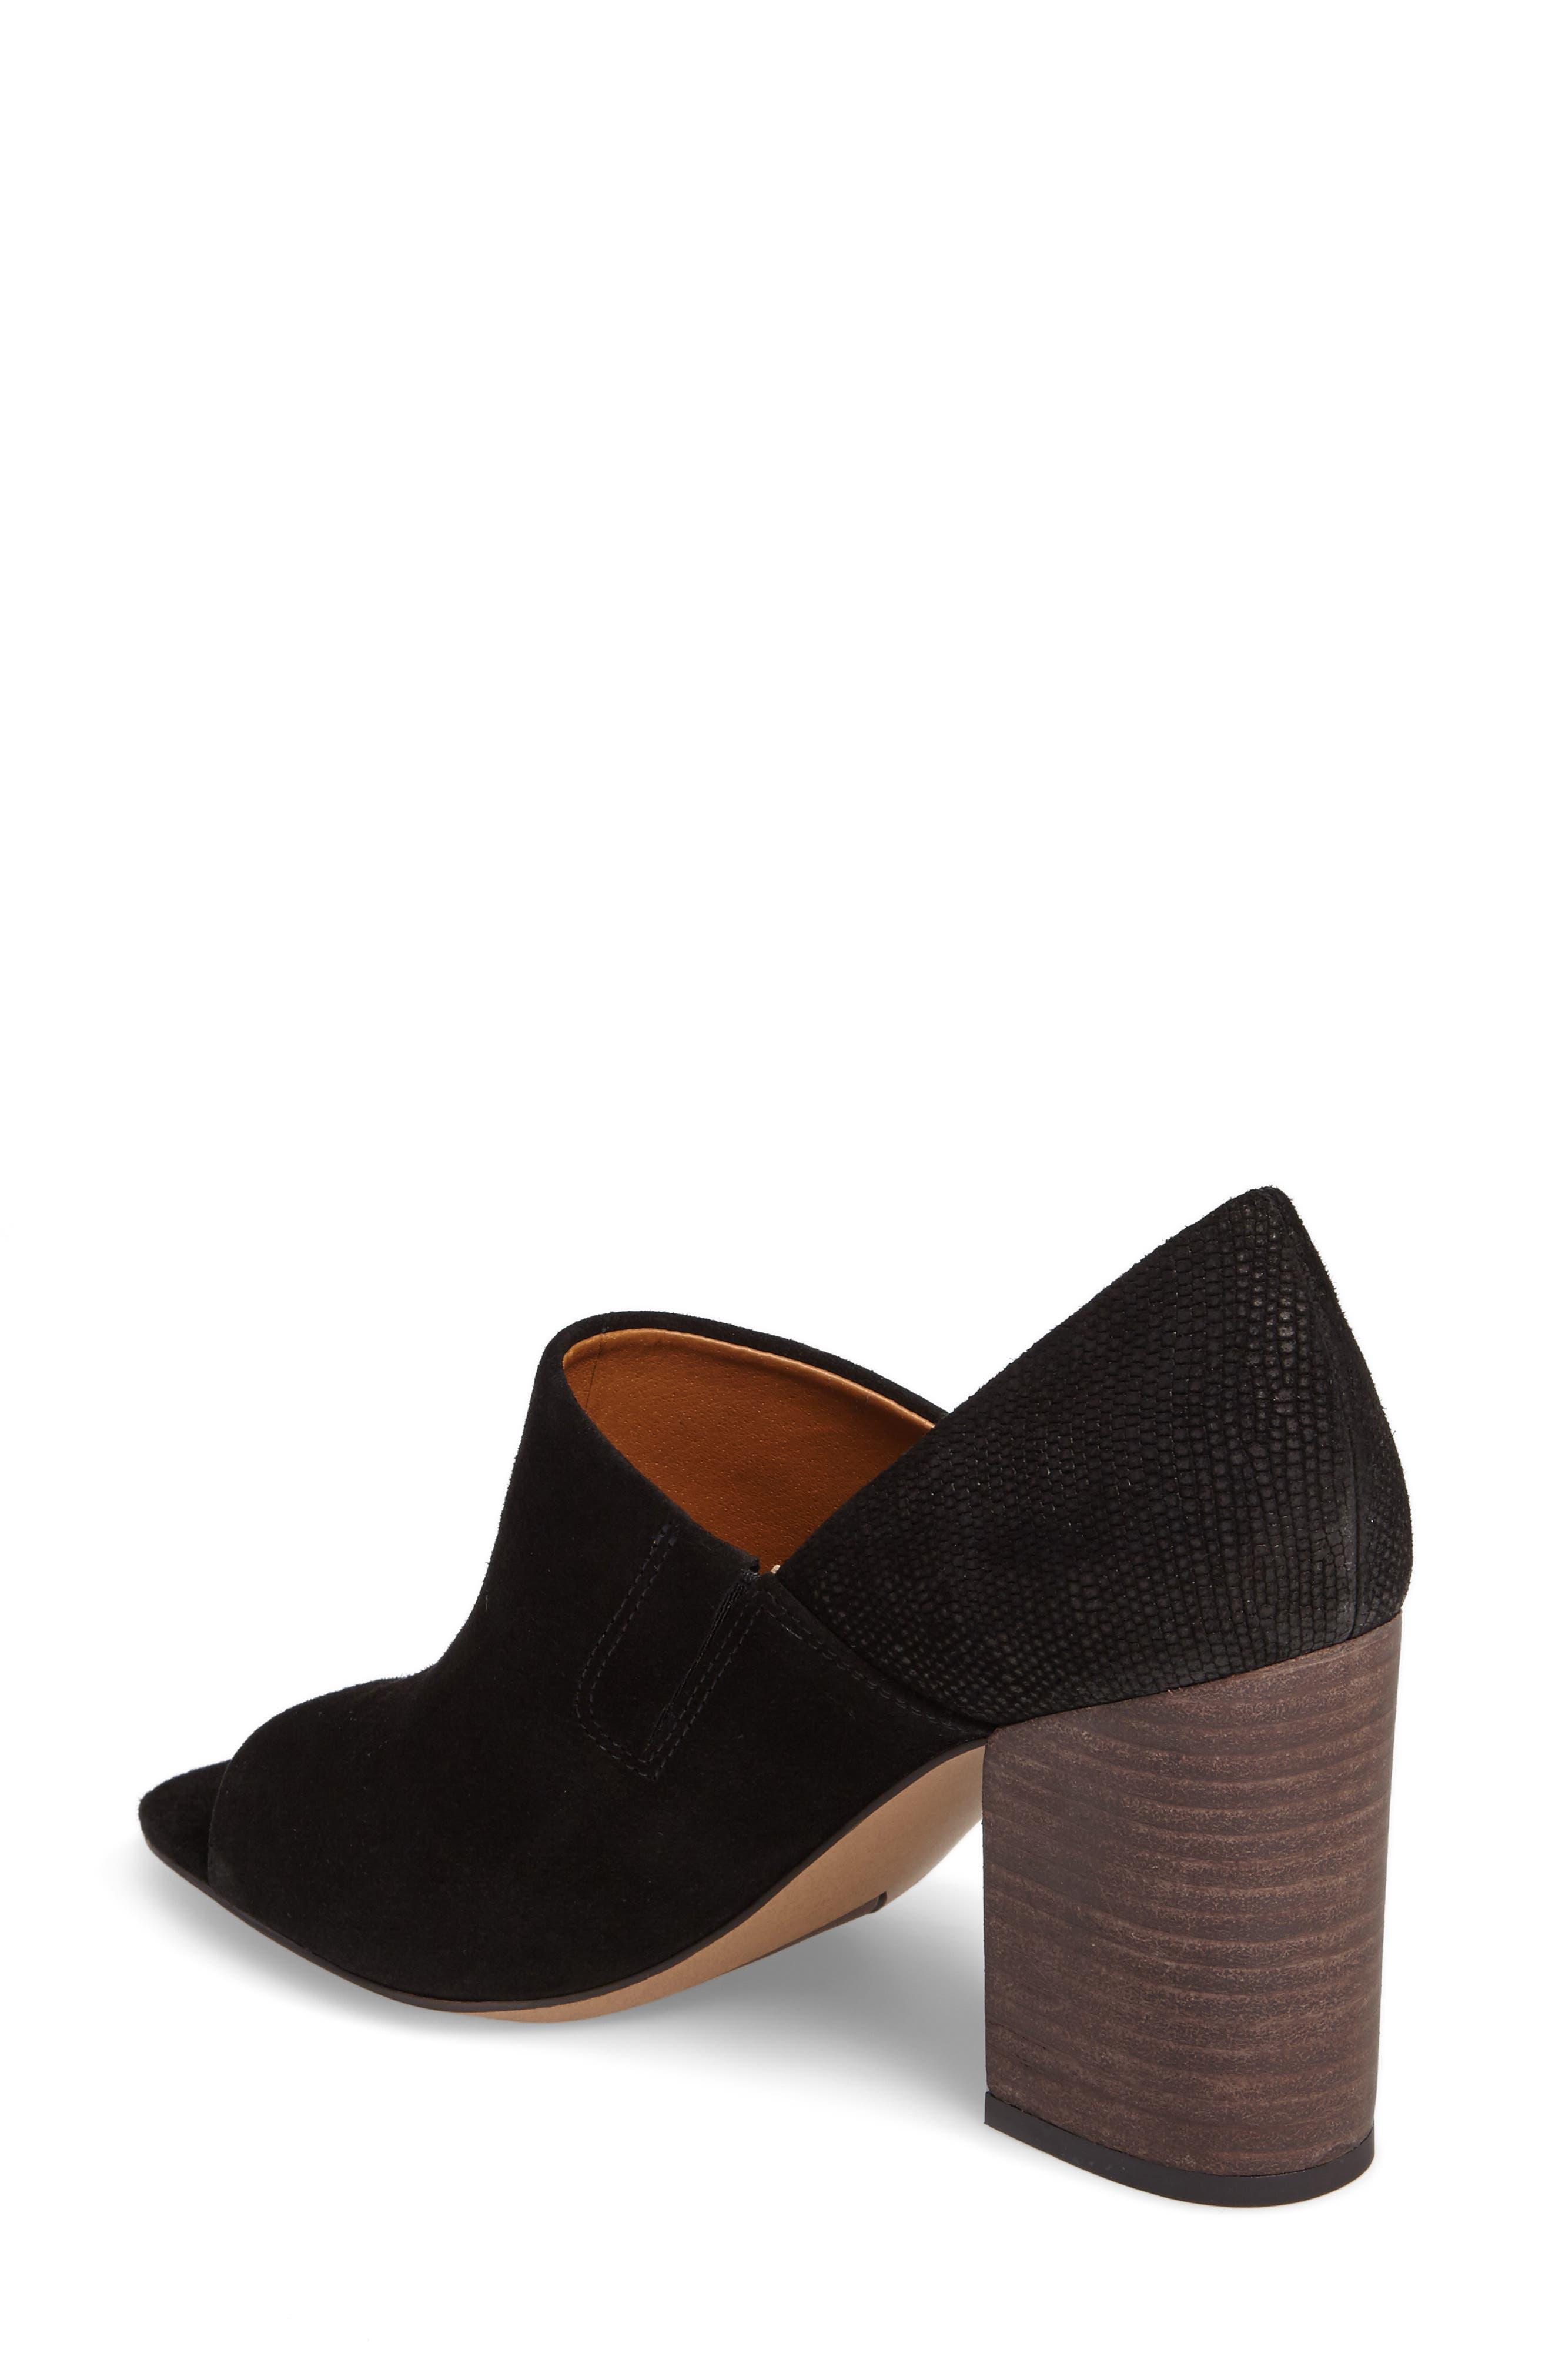 Ellison Block Heel Sandal,                             Alternate thumbnail 2, color,                             001